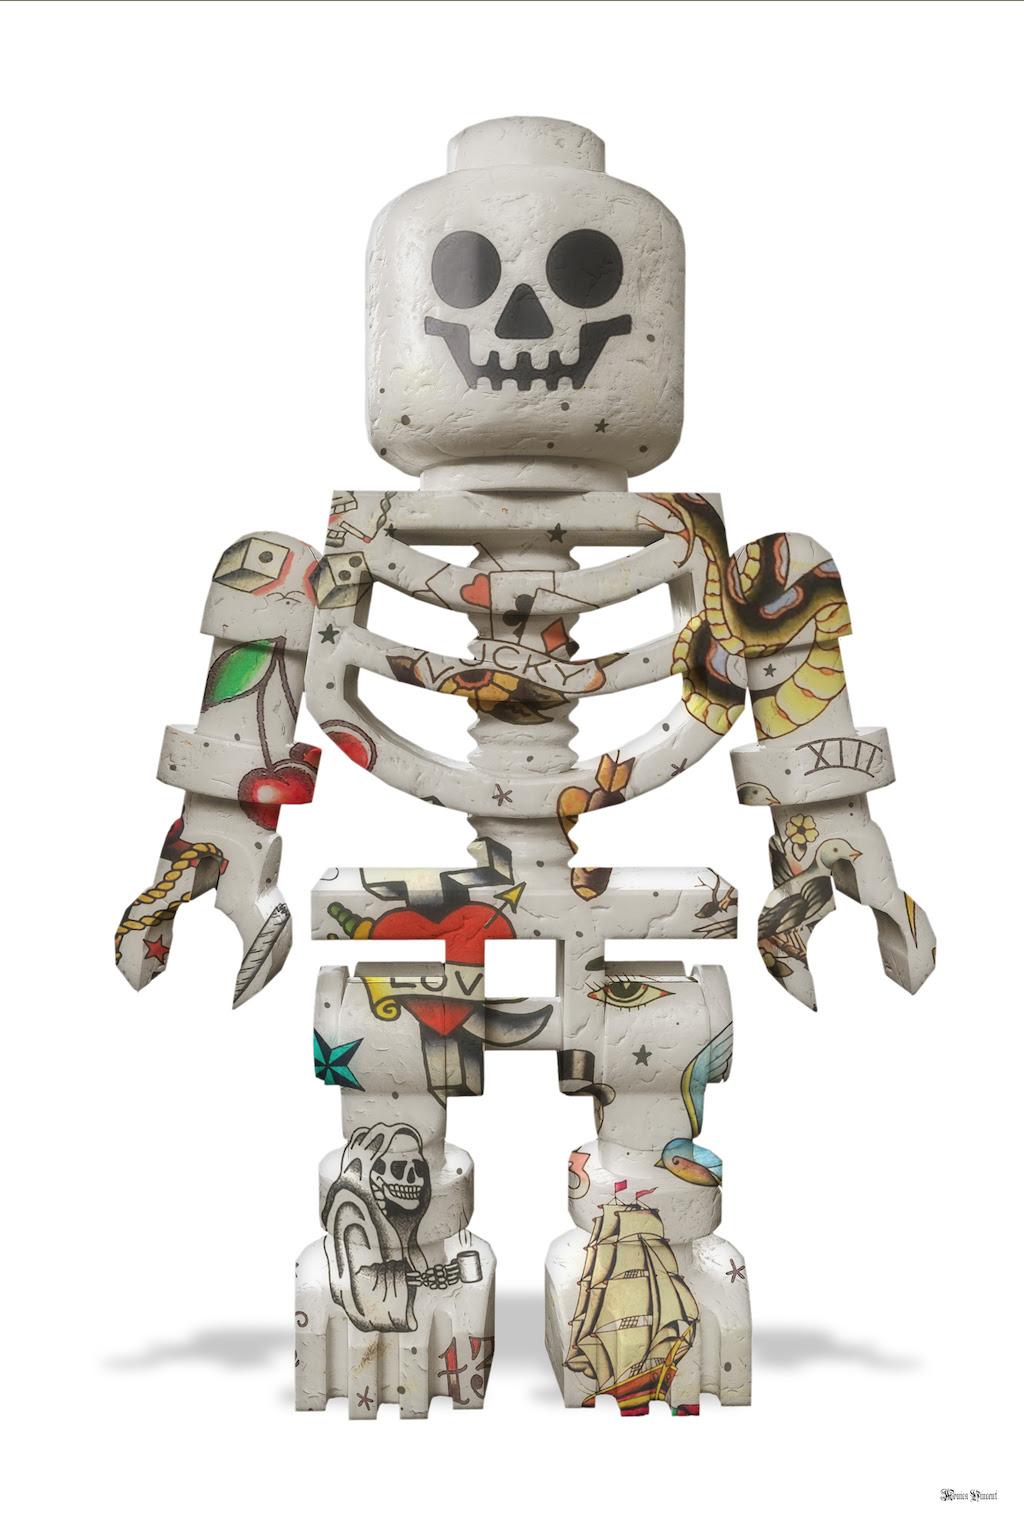 Lego Skeleton (White Background) - Large by Monica Vincent